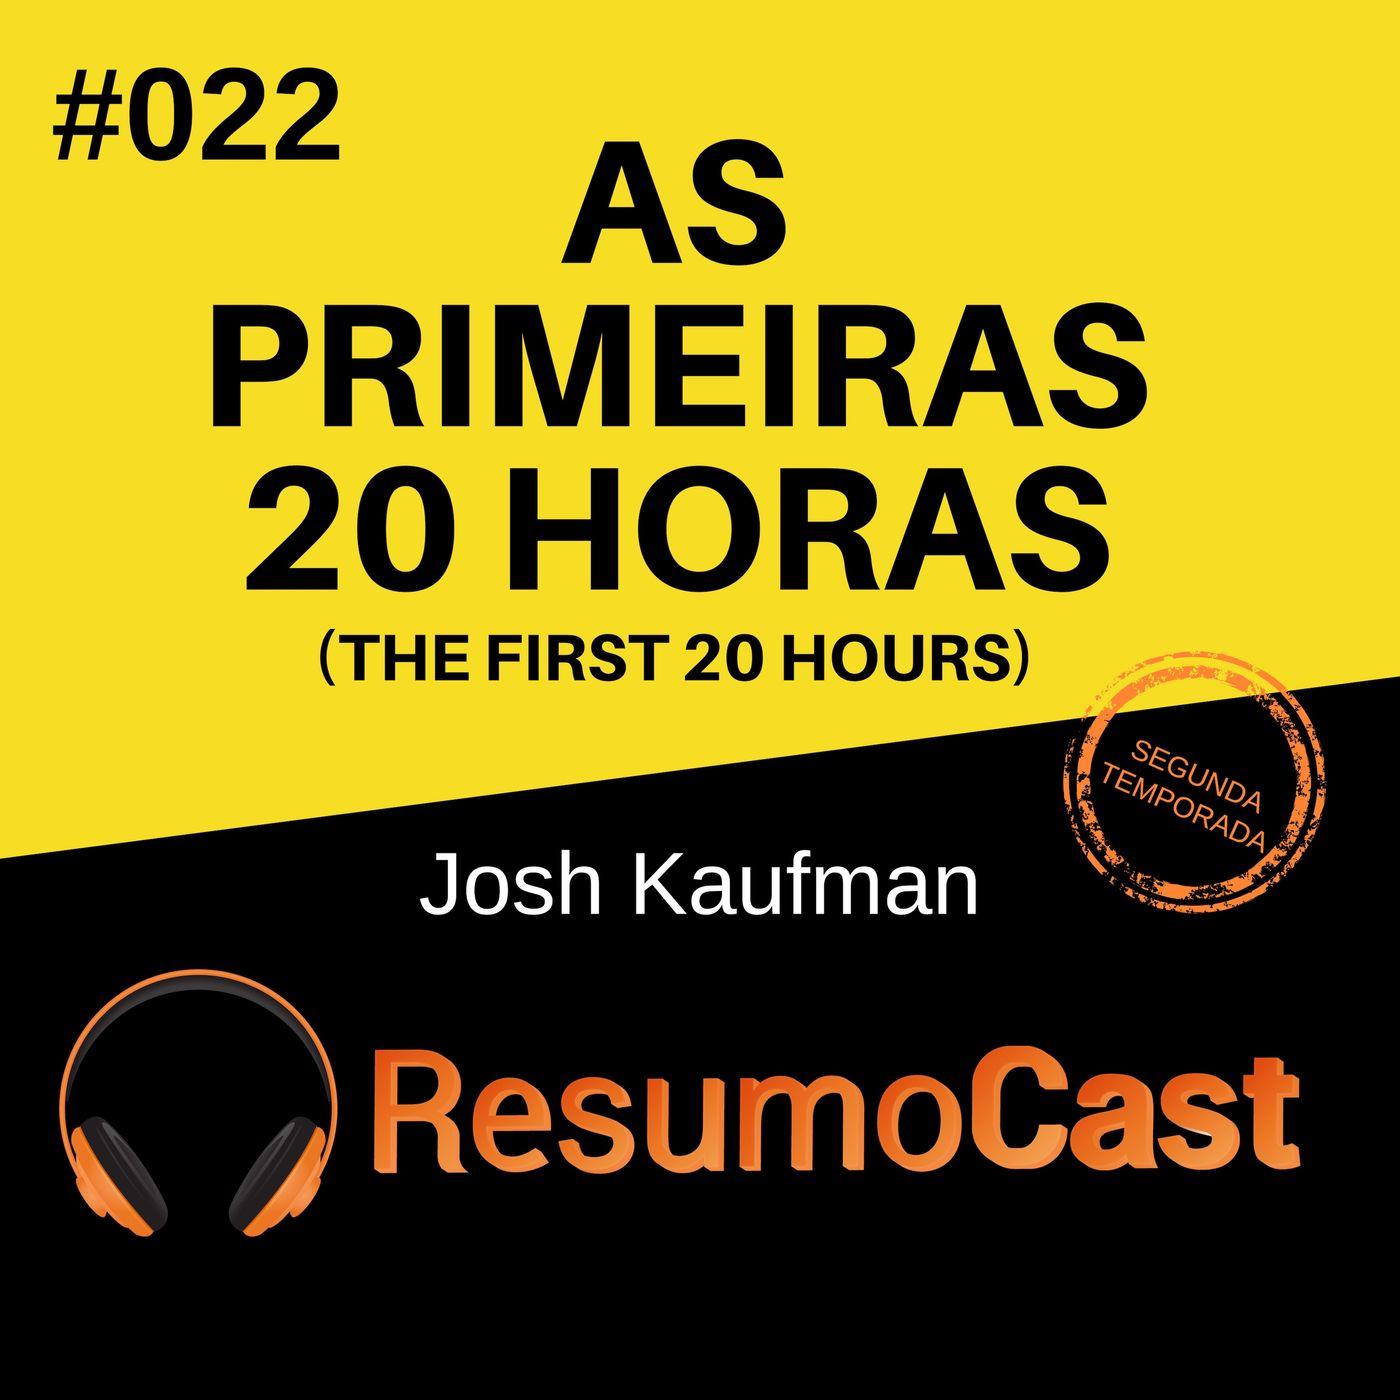 T2#022 As primeiras 20 horas - First 20 hours | Josh Kaufman